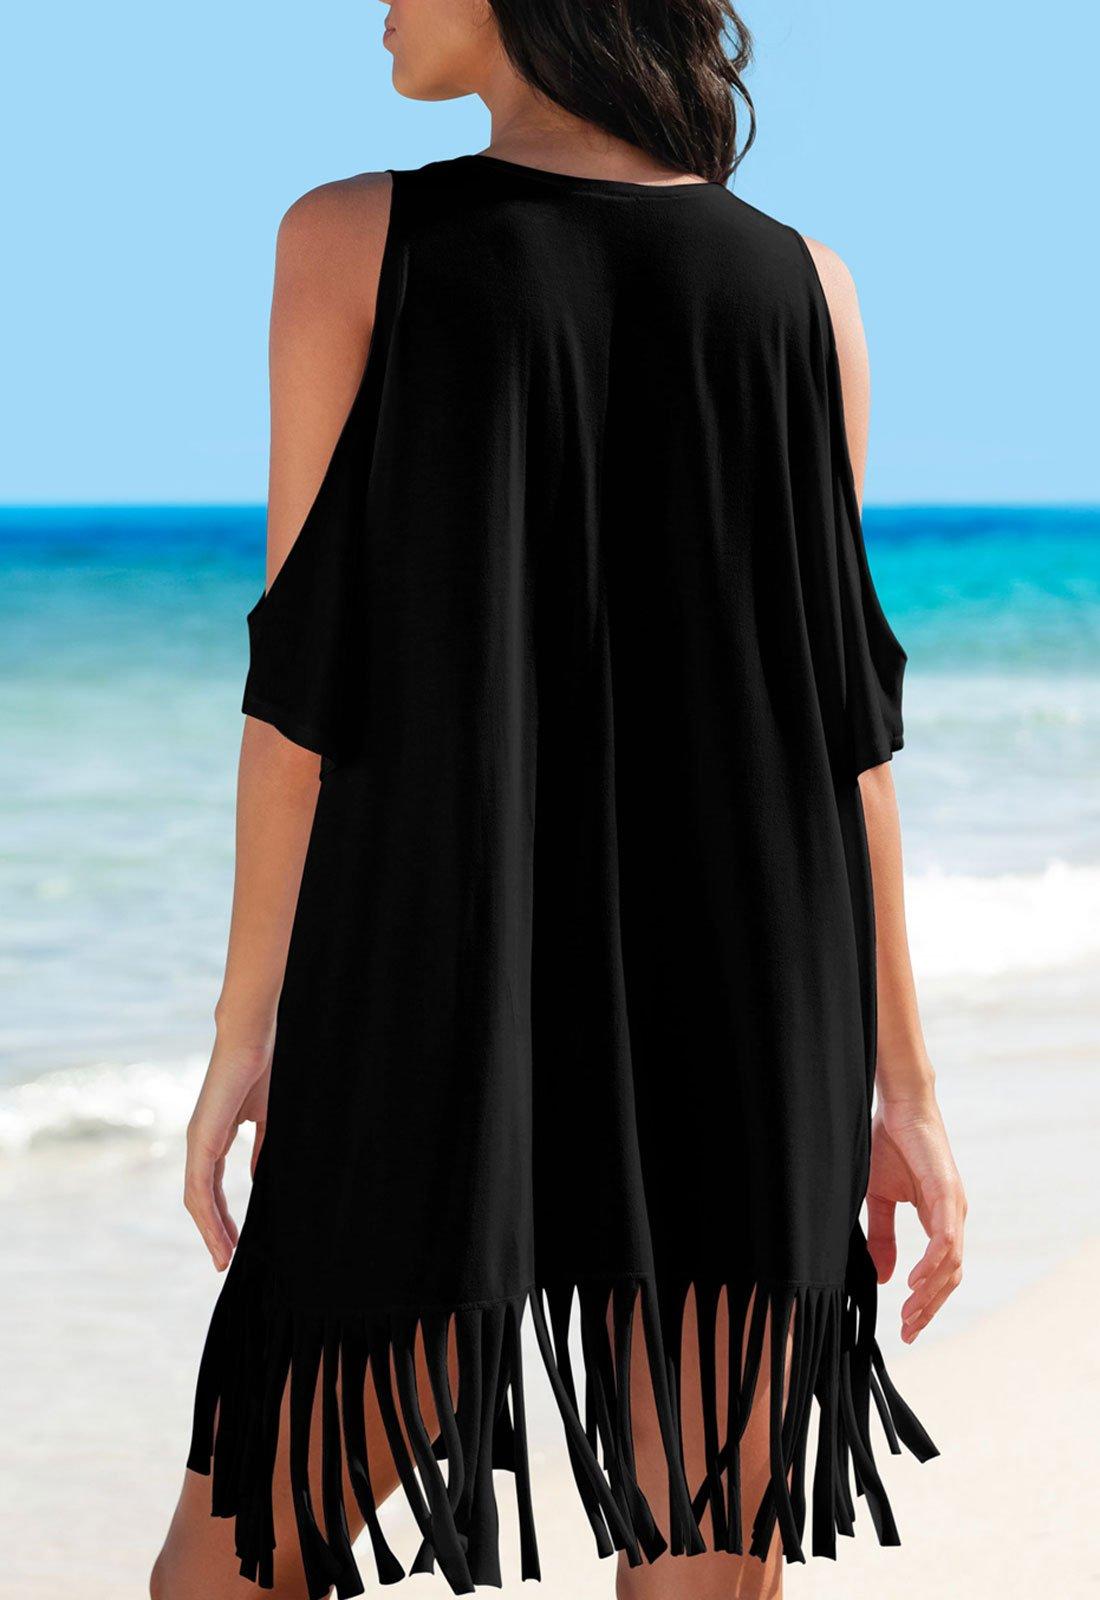 Rainlover Womens Letters Print Baggy Swimwear Bikini Cover-ups Beach Dress (BB-Black) by Rainlover (Image #2)